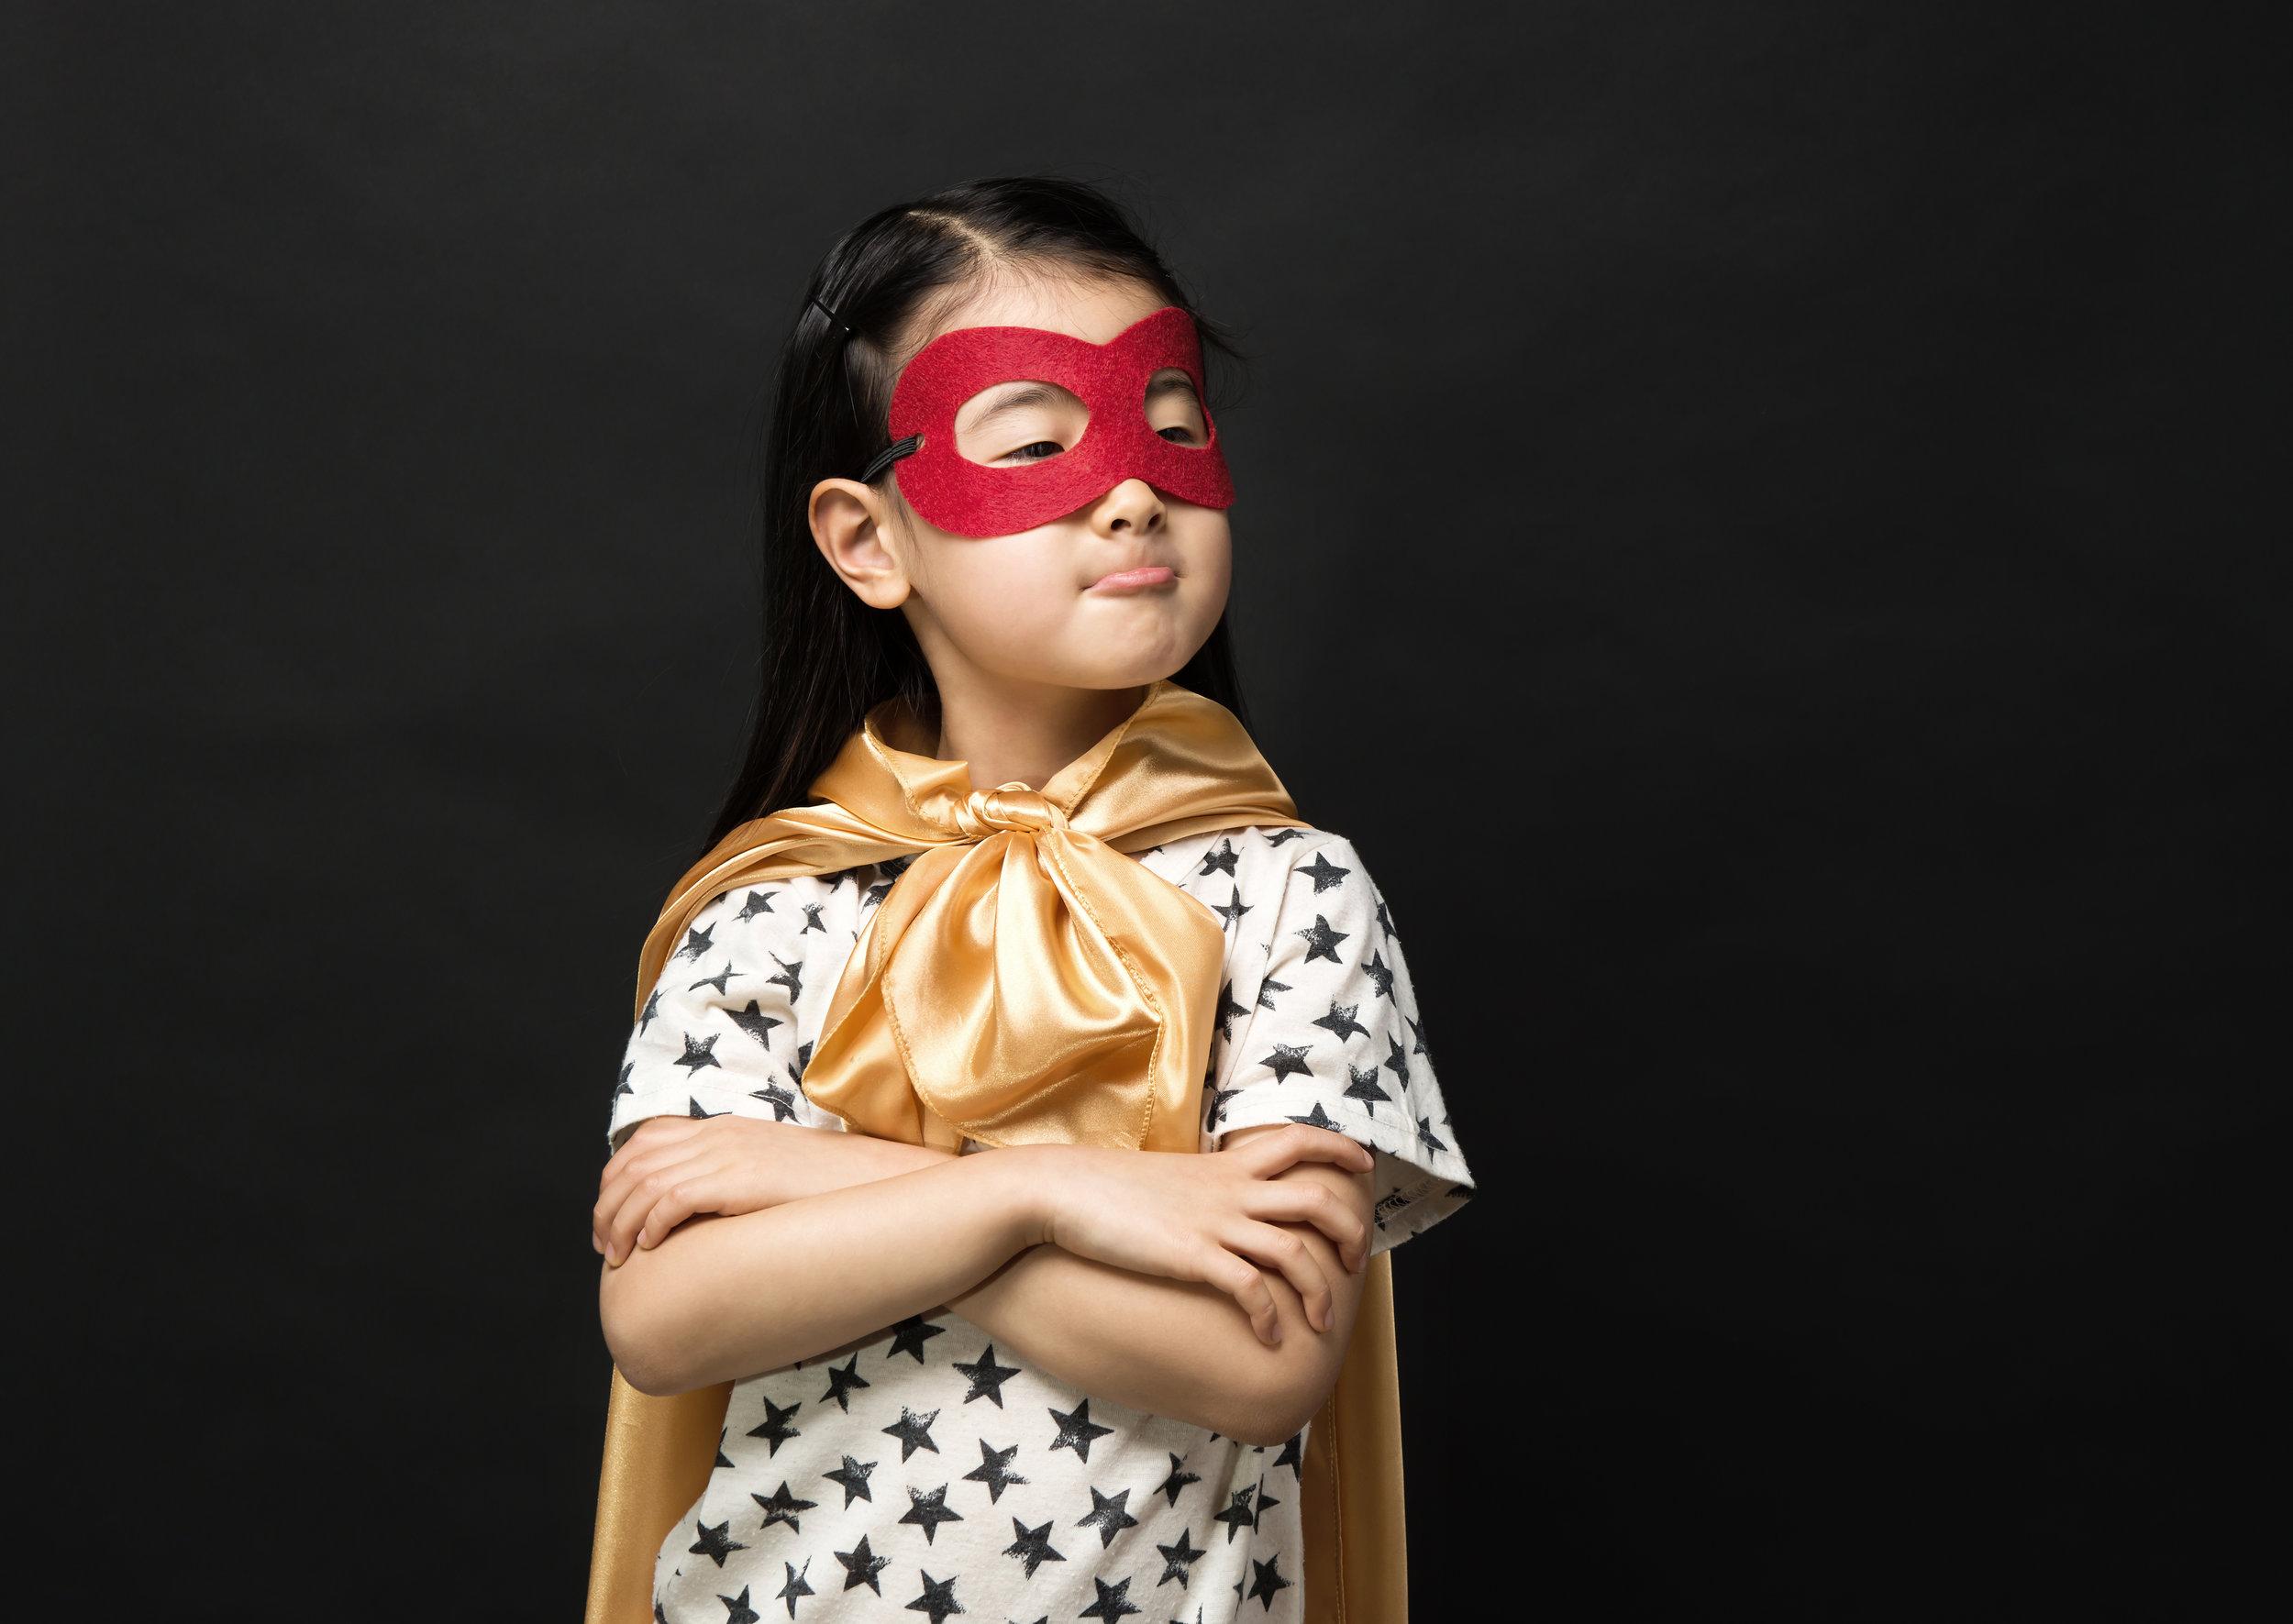 graphicstock-superhero-kids-on-a-black-background_rbRIsJiwb.jpg